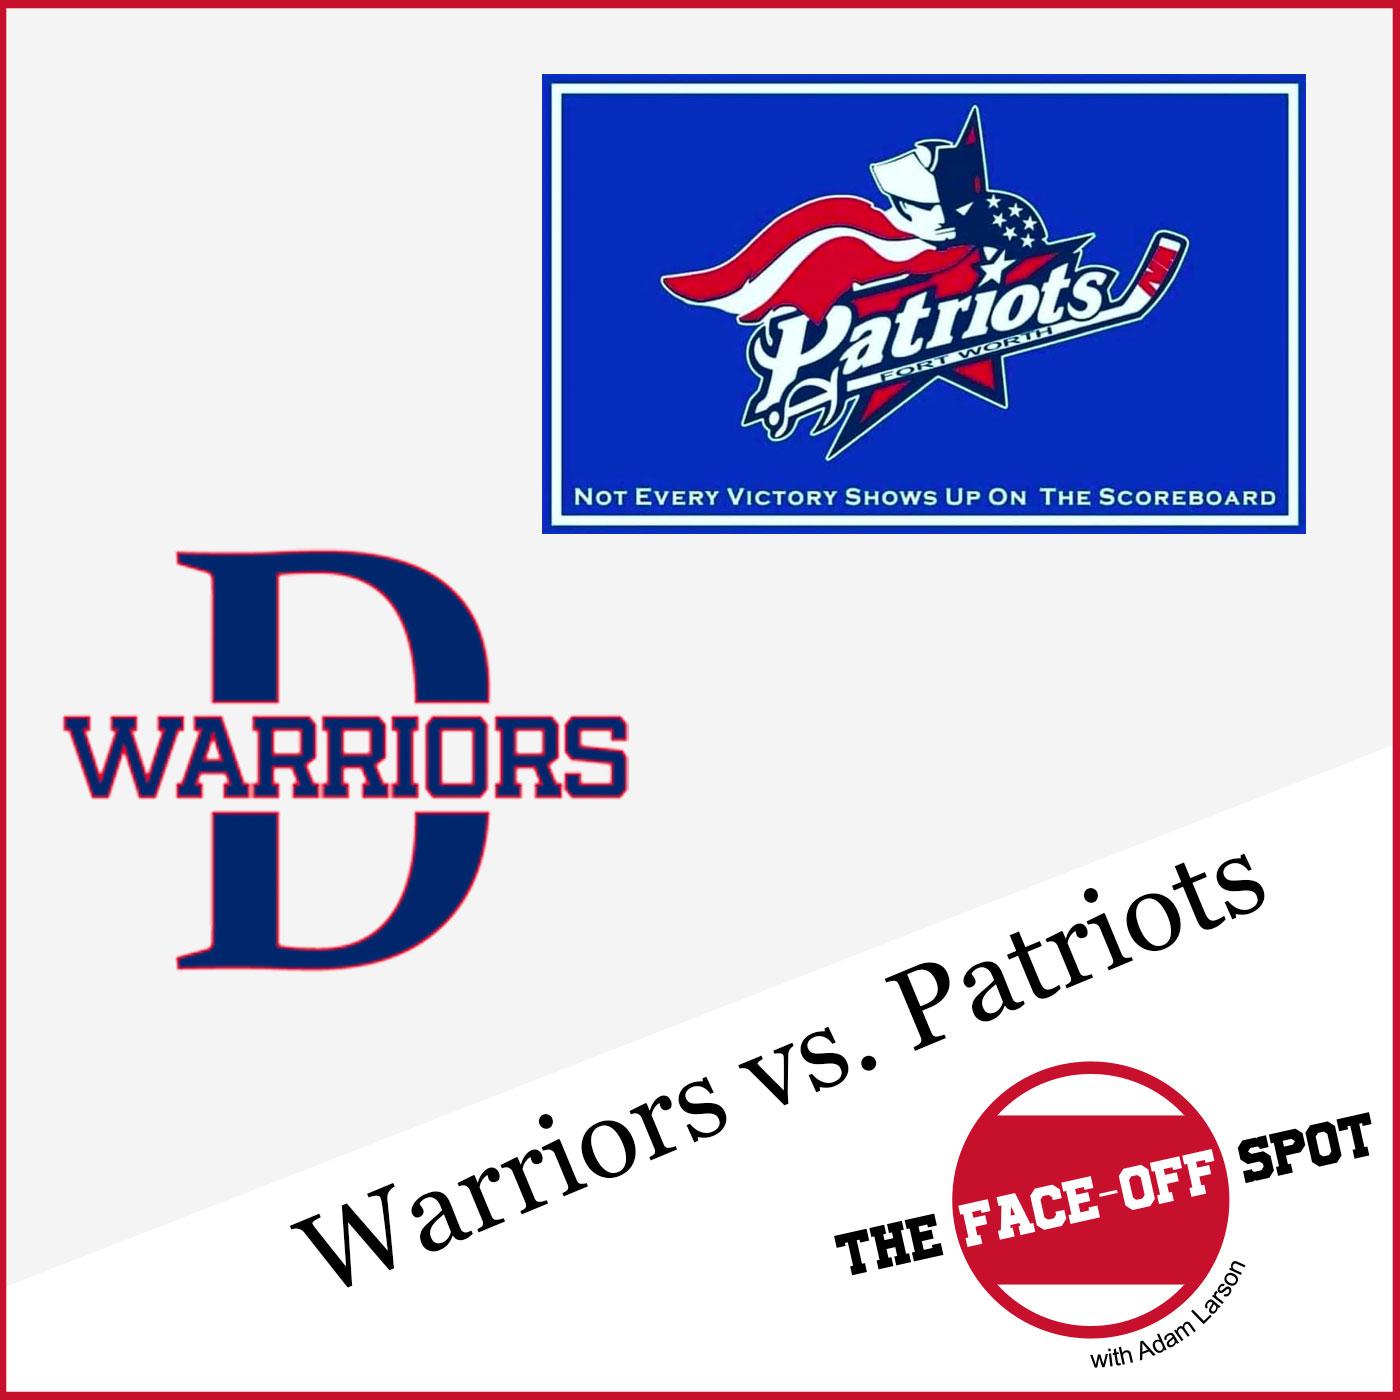 Episode 52 - Dallas Warriors / Fort Worth Patriots